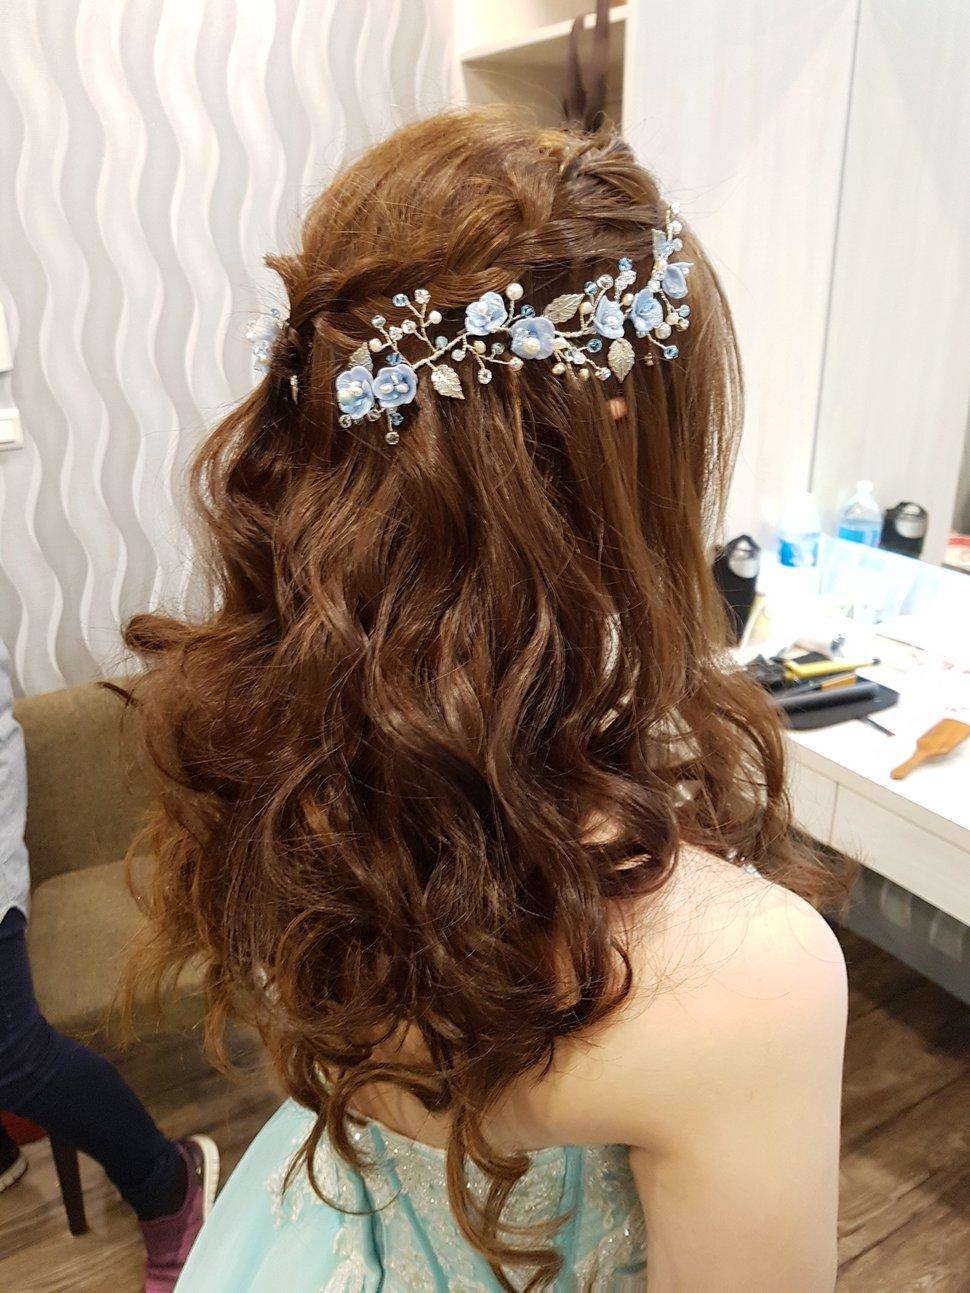 MYXJ_20171112234357_save - Serin Style曦曦 - 結婚吧